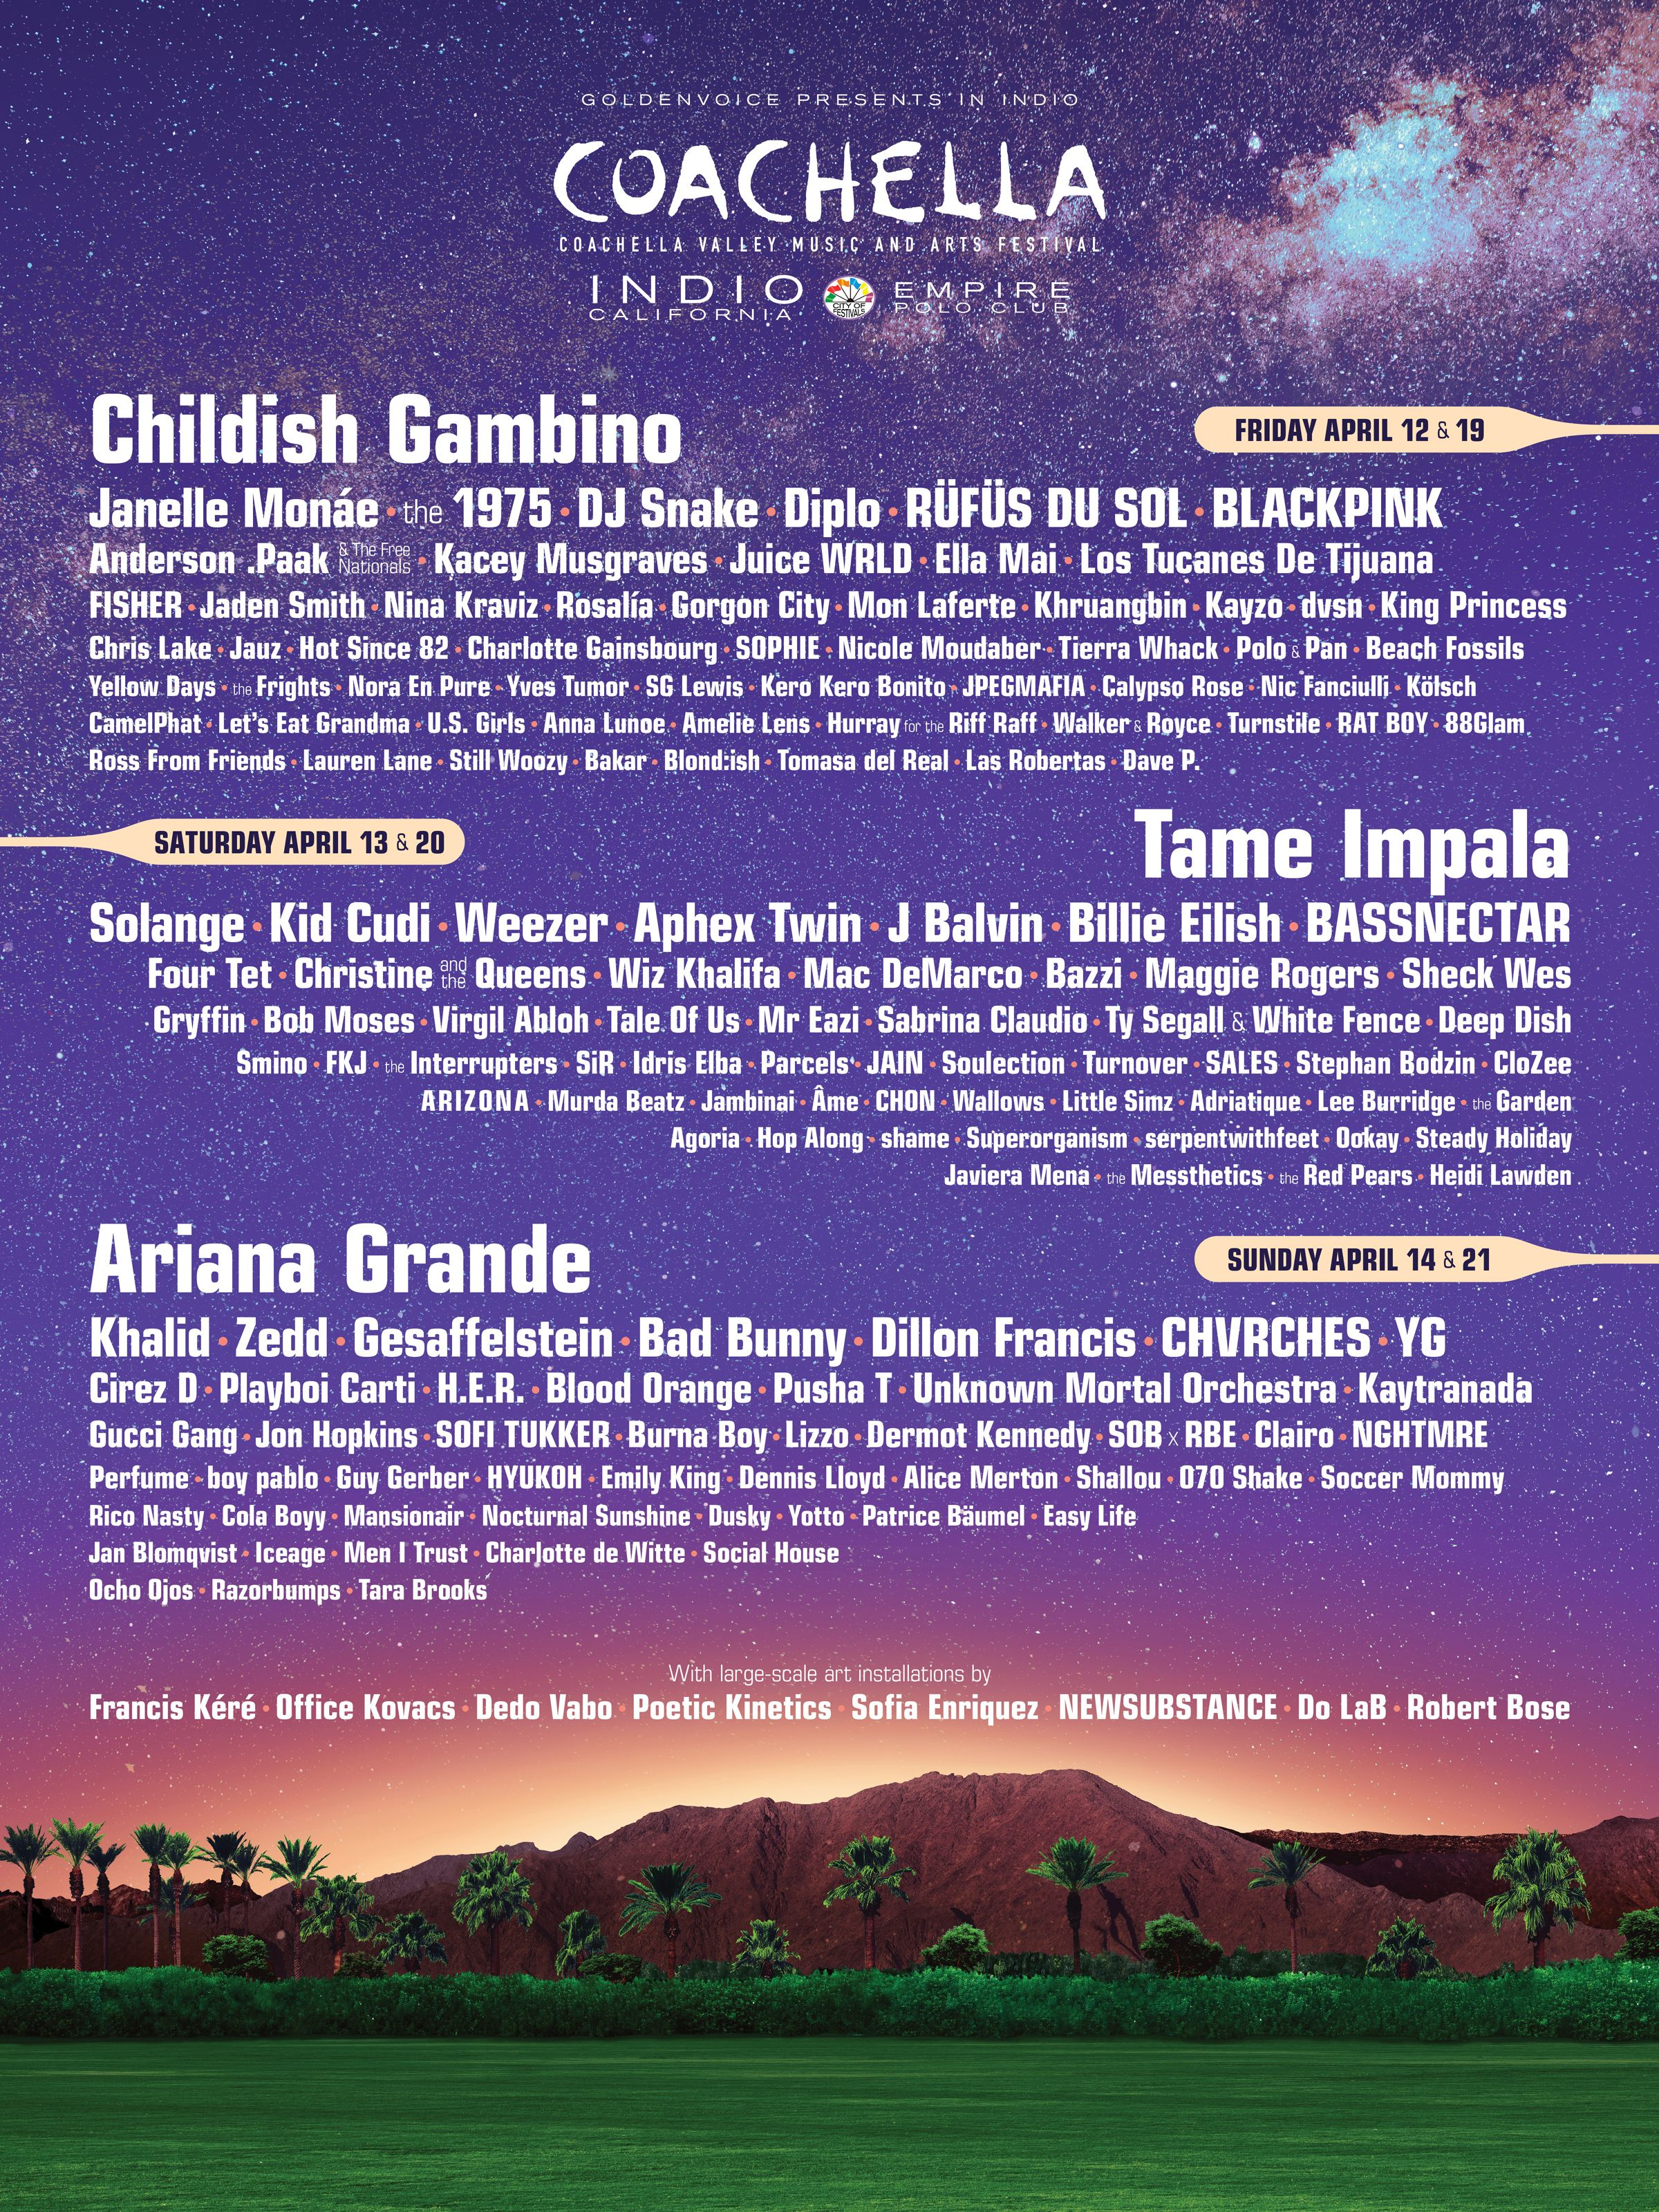 2019 Coachella Poster